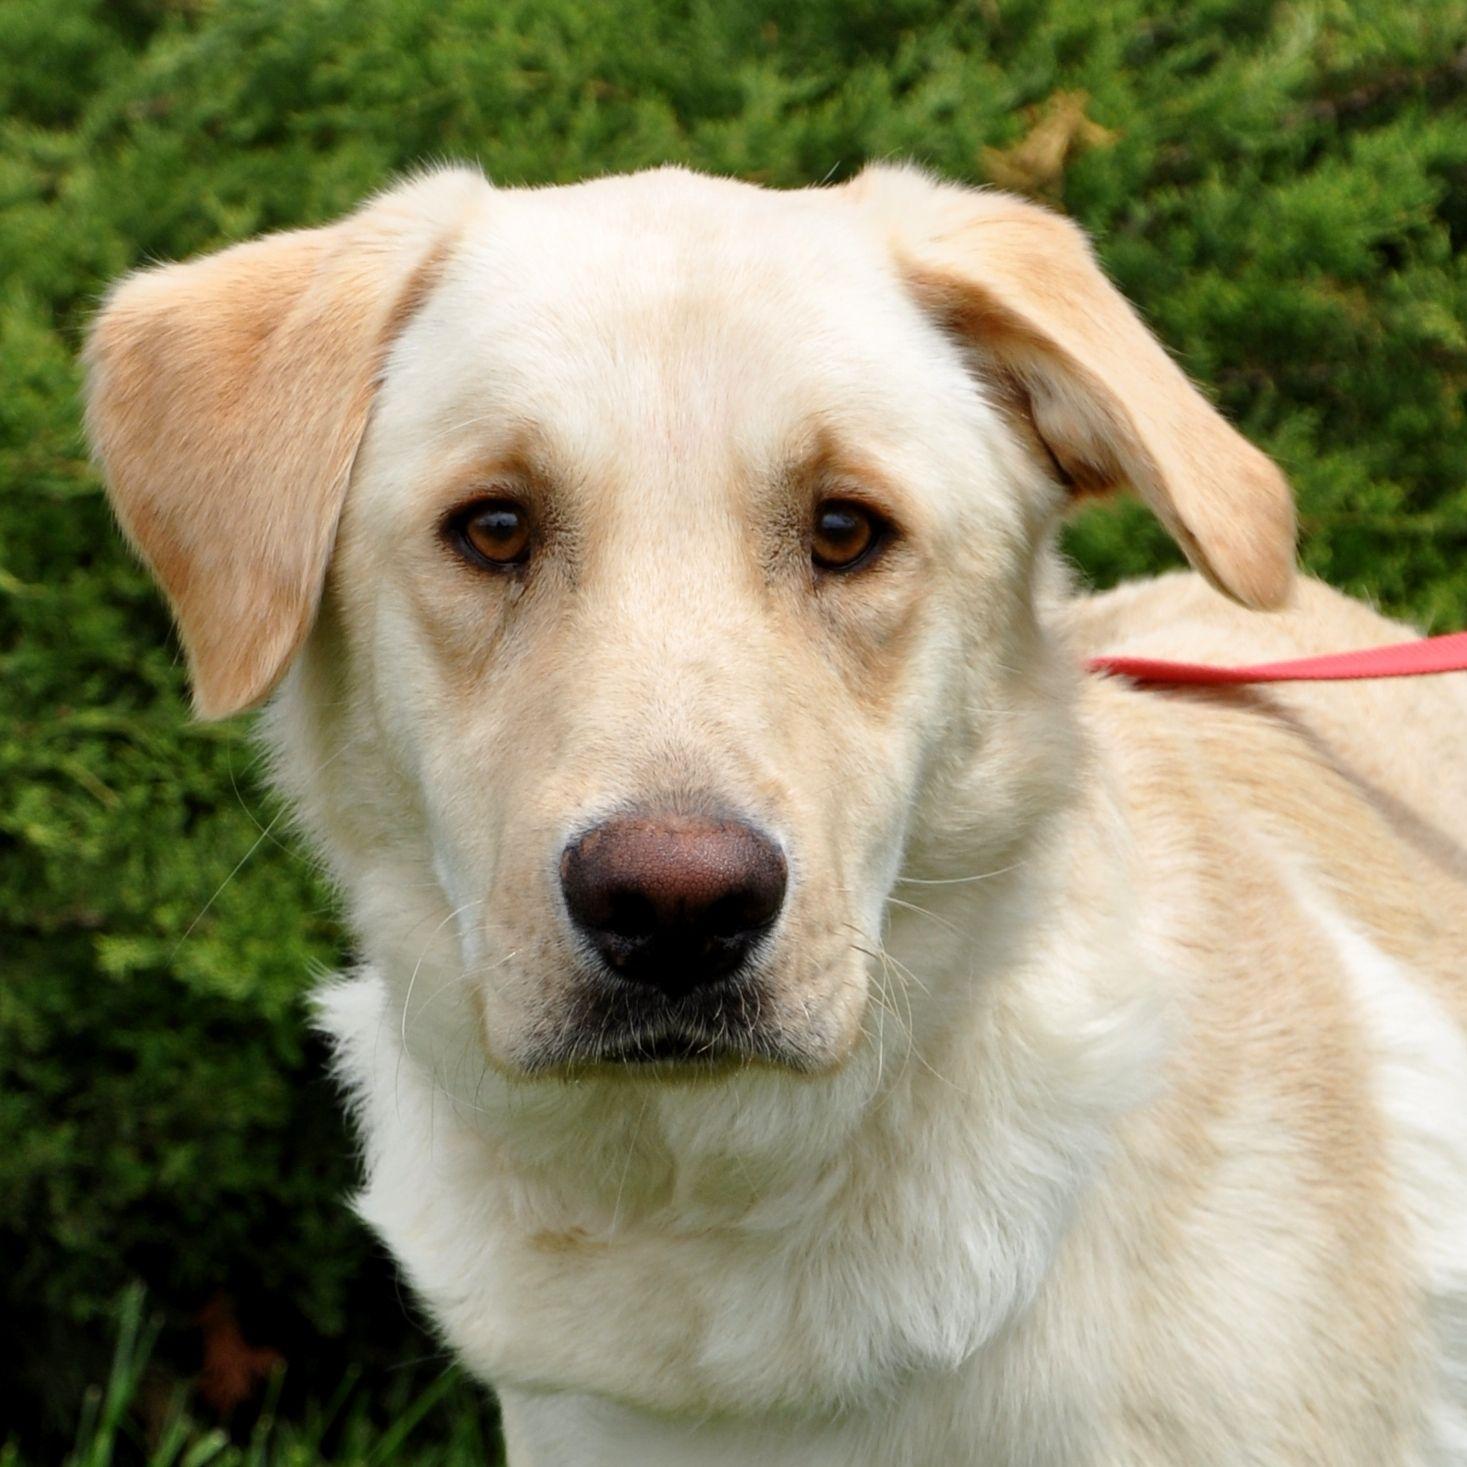 White Golden Retriever Lab Mix Google Search Golden Retriever Lab Retriever Puppy Golden Retriever White